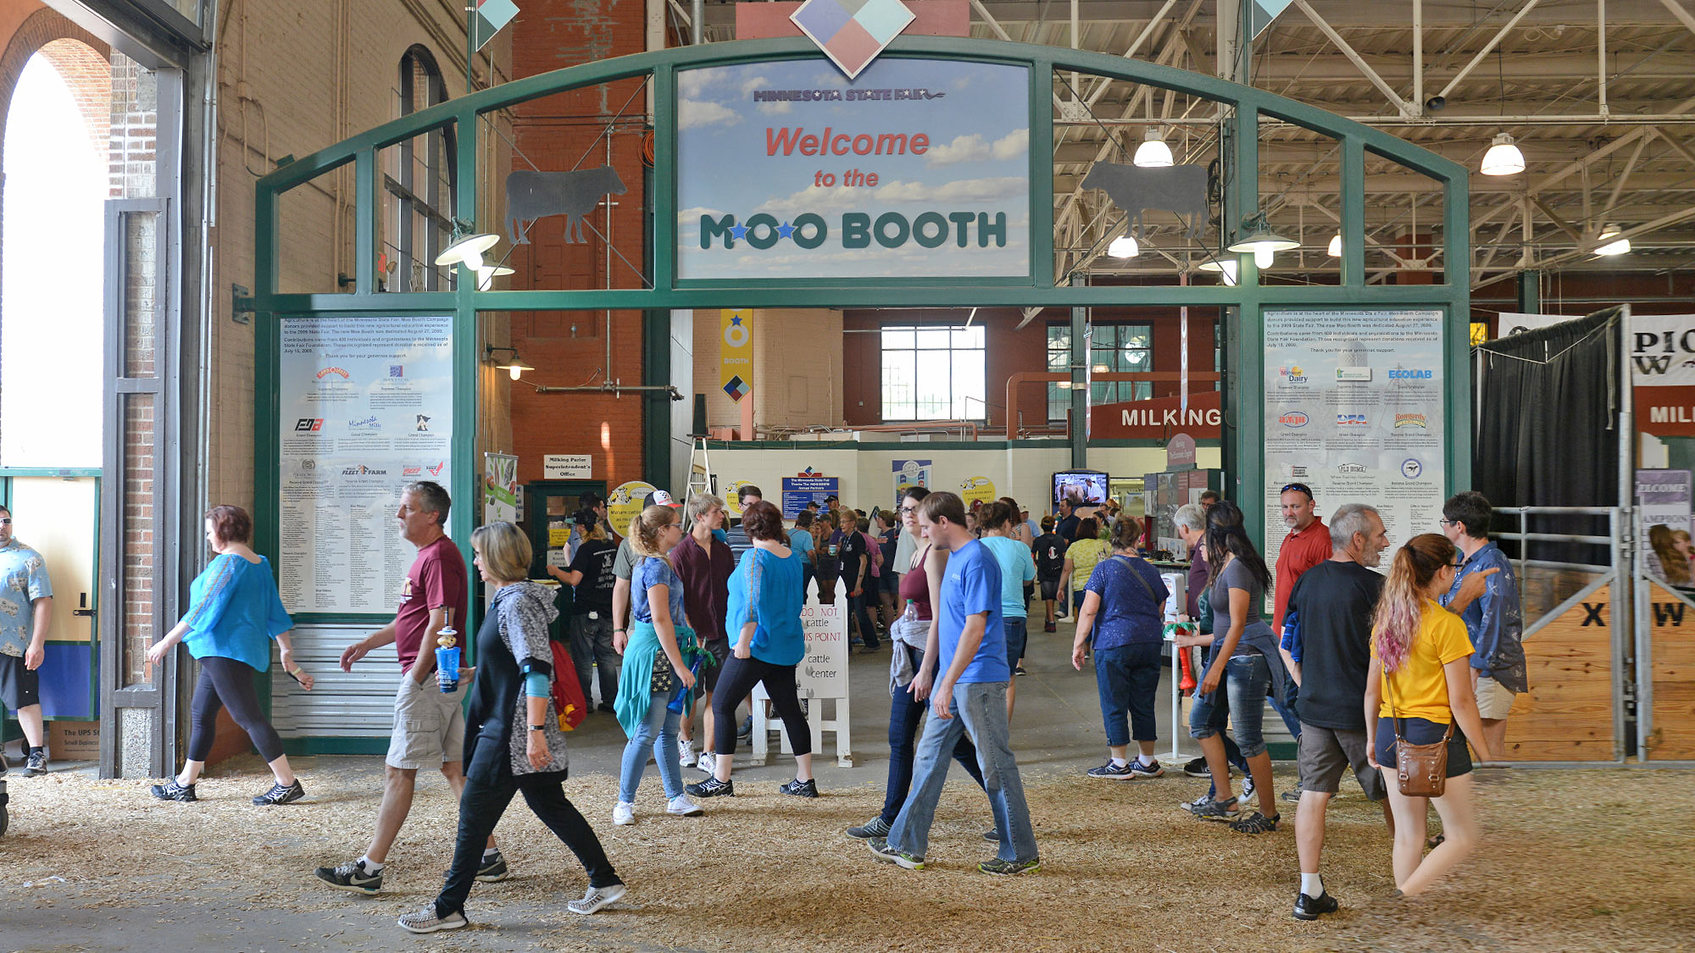 Moo Booth